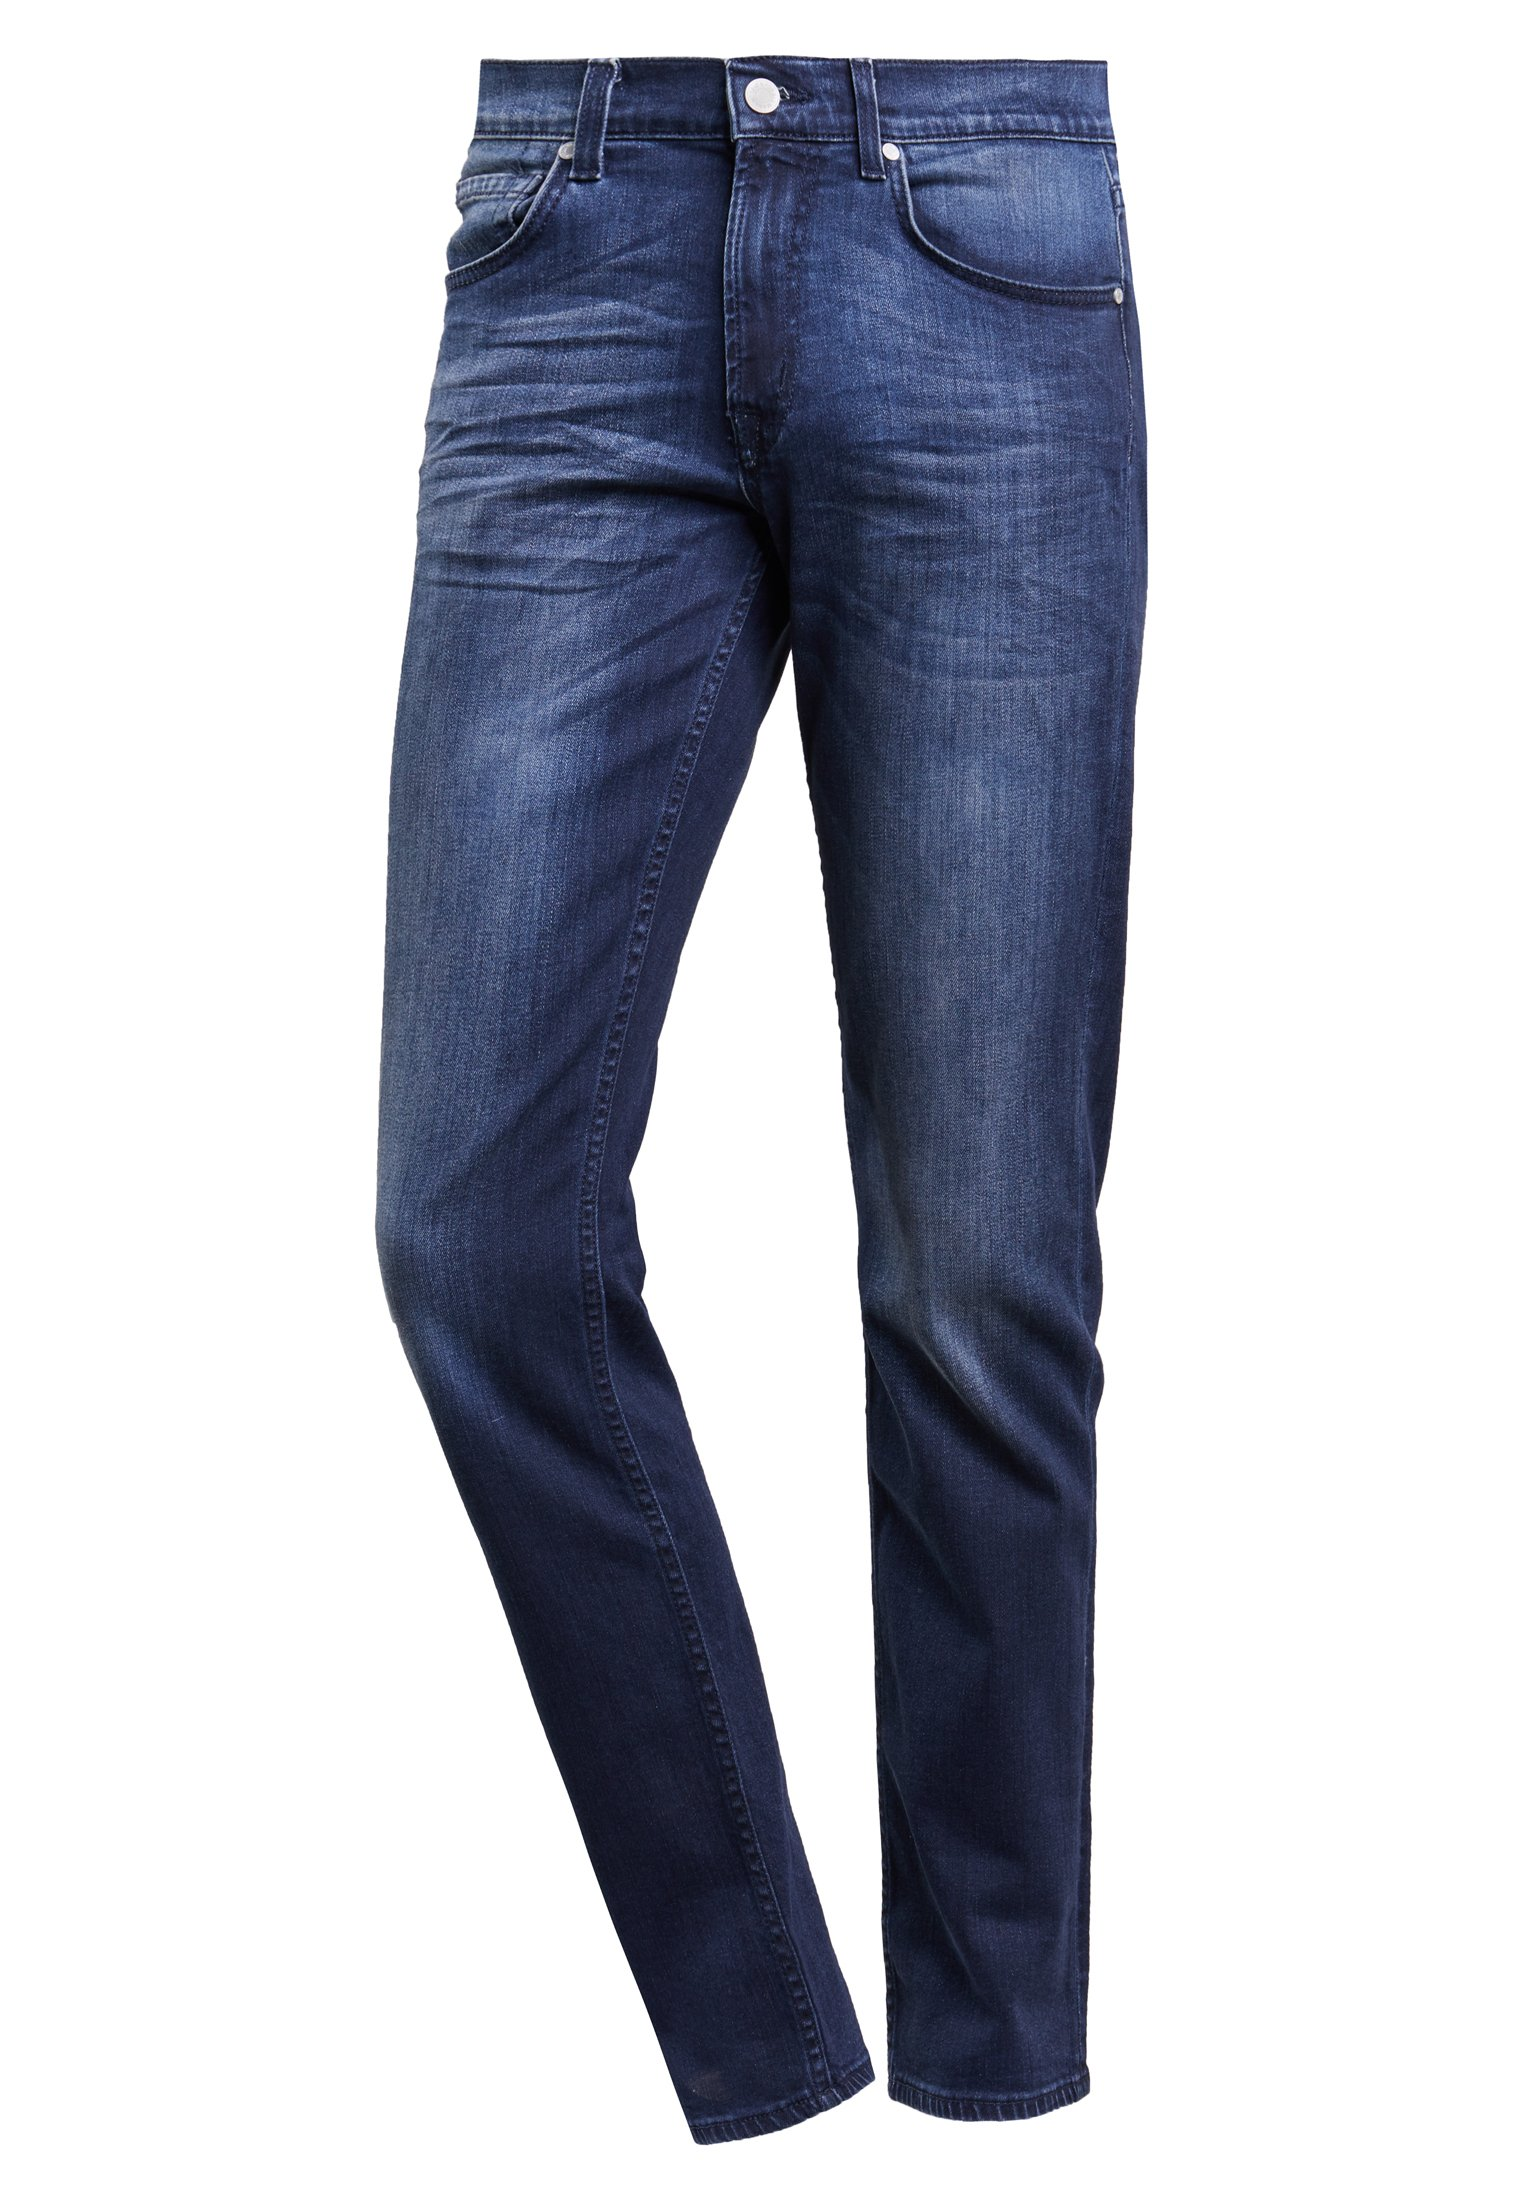 7 For All Mankind Slimmy - Jeans Slim Fit Dunkelblau 3yxH9YrA 4T